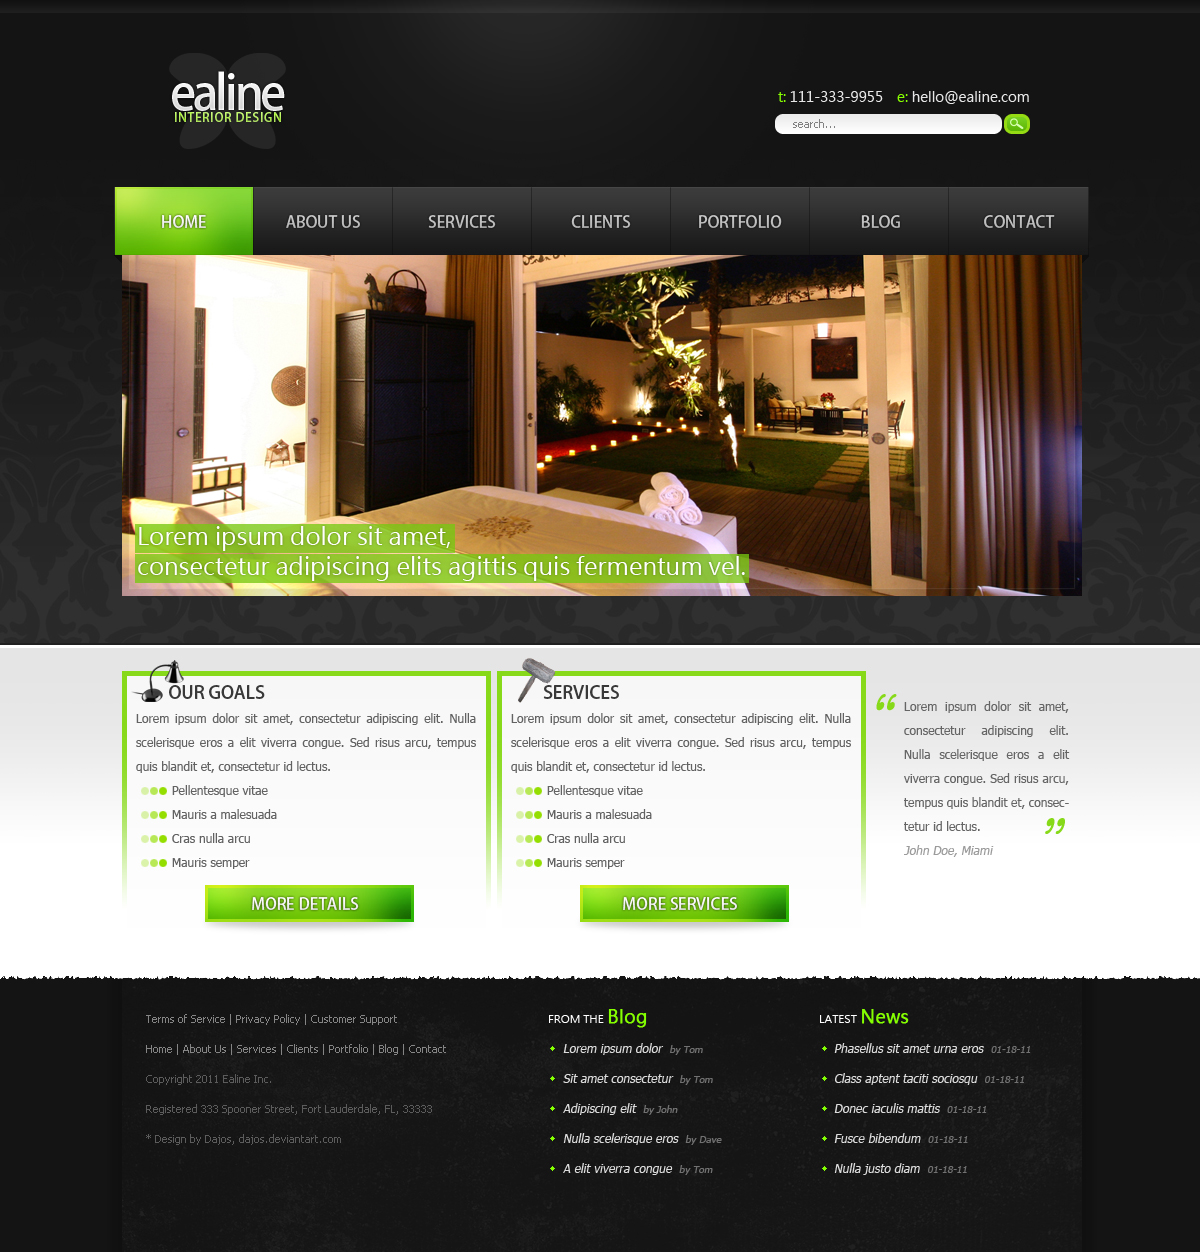 Ealine interior design web by dajos on deviantart for Interior designs website